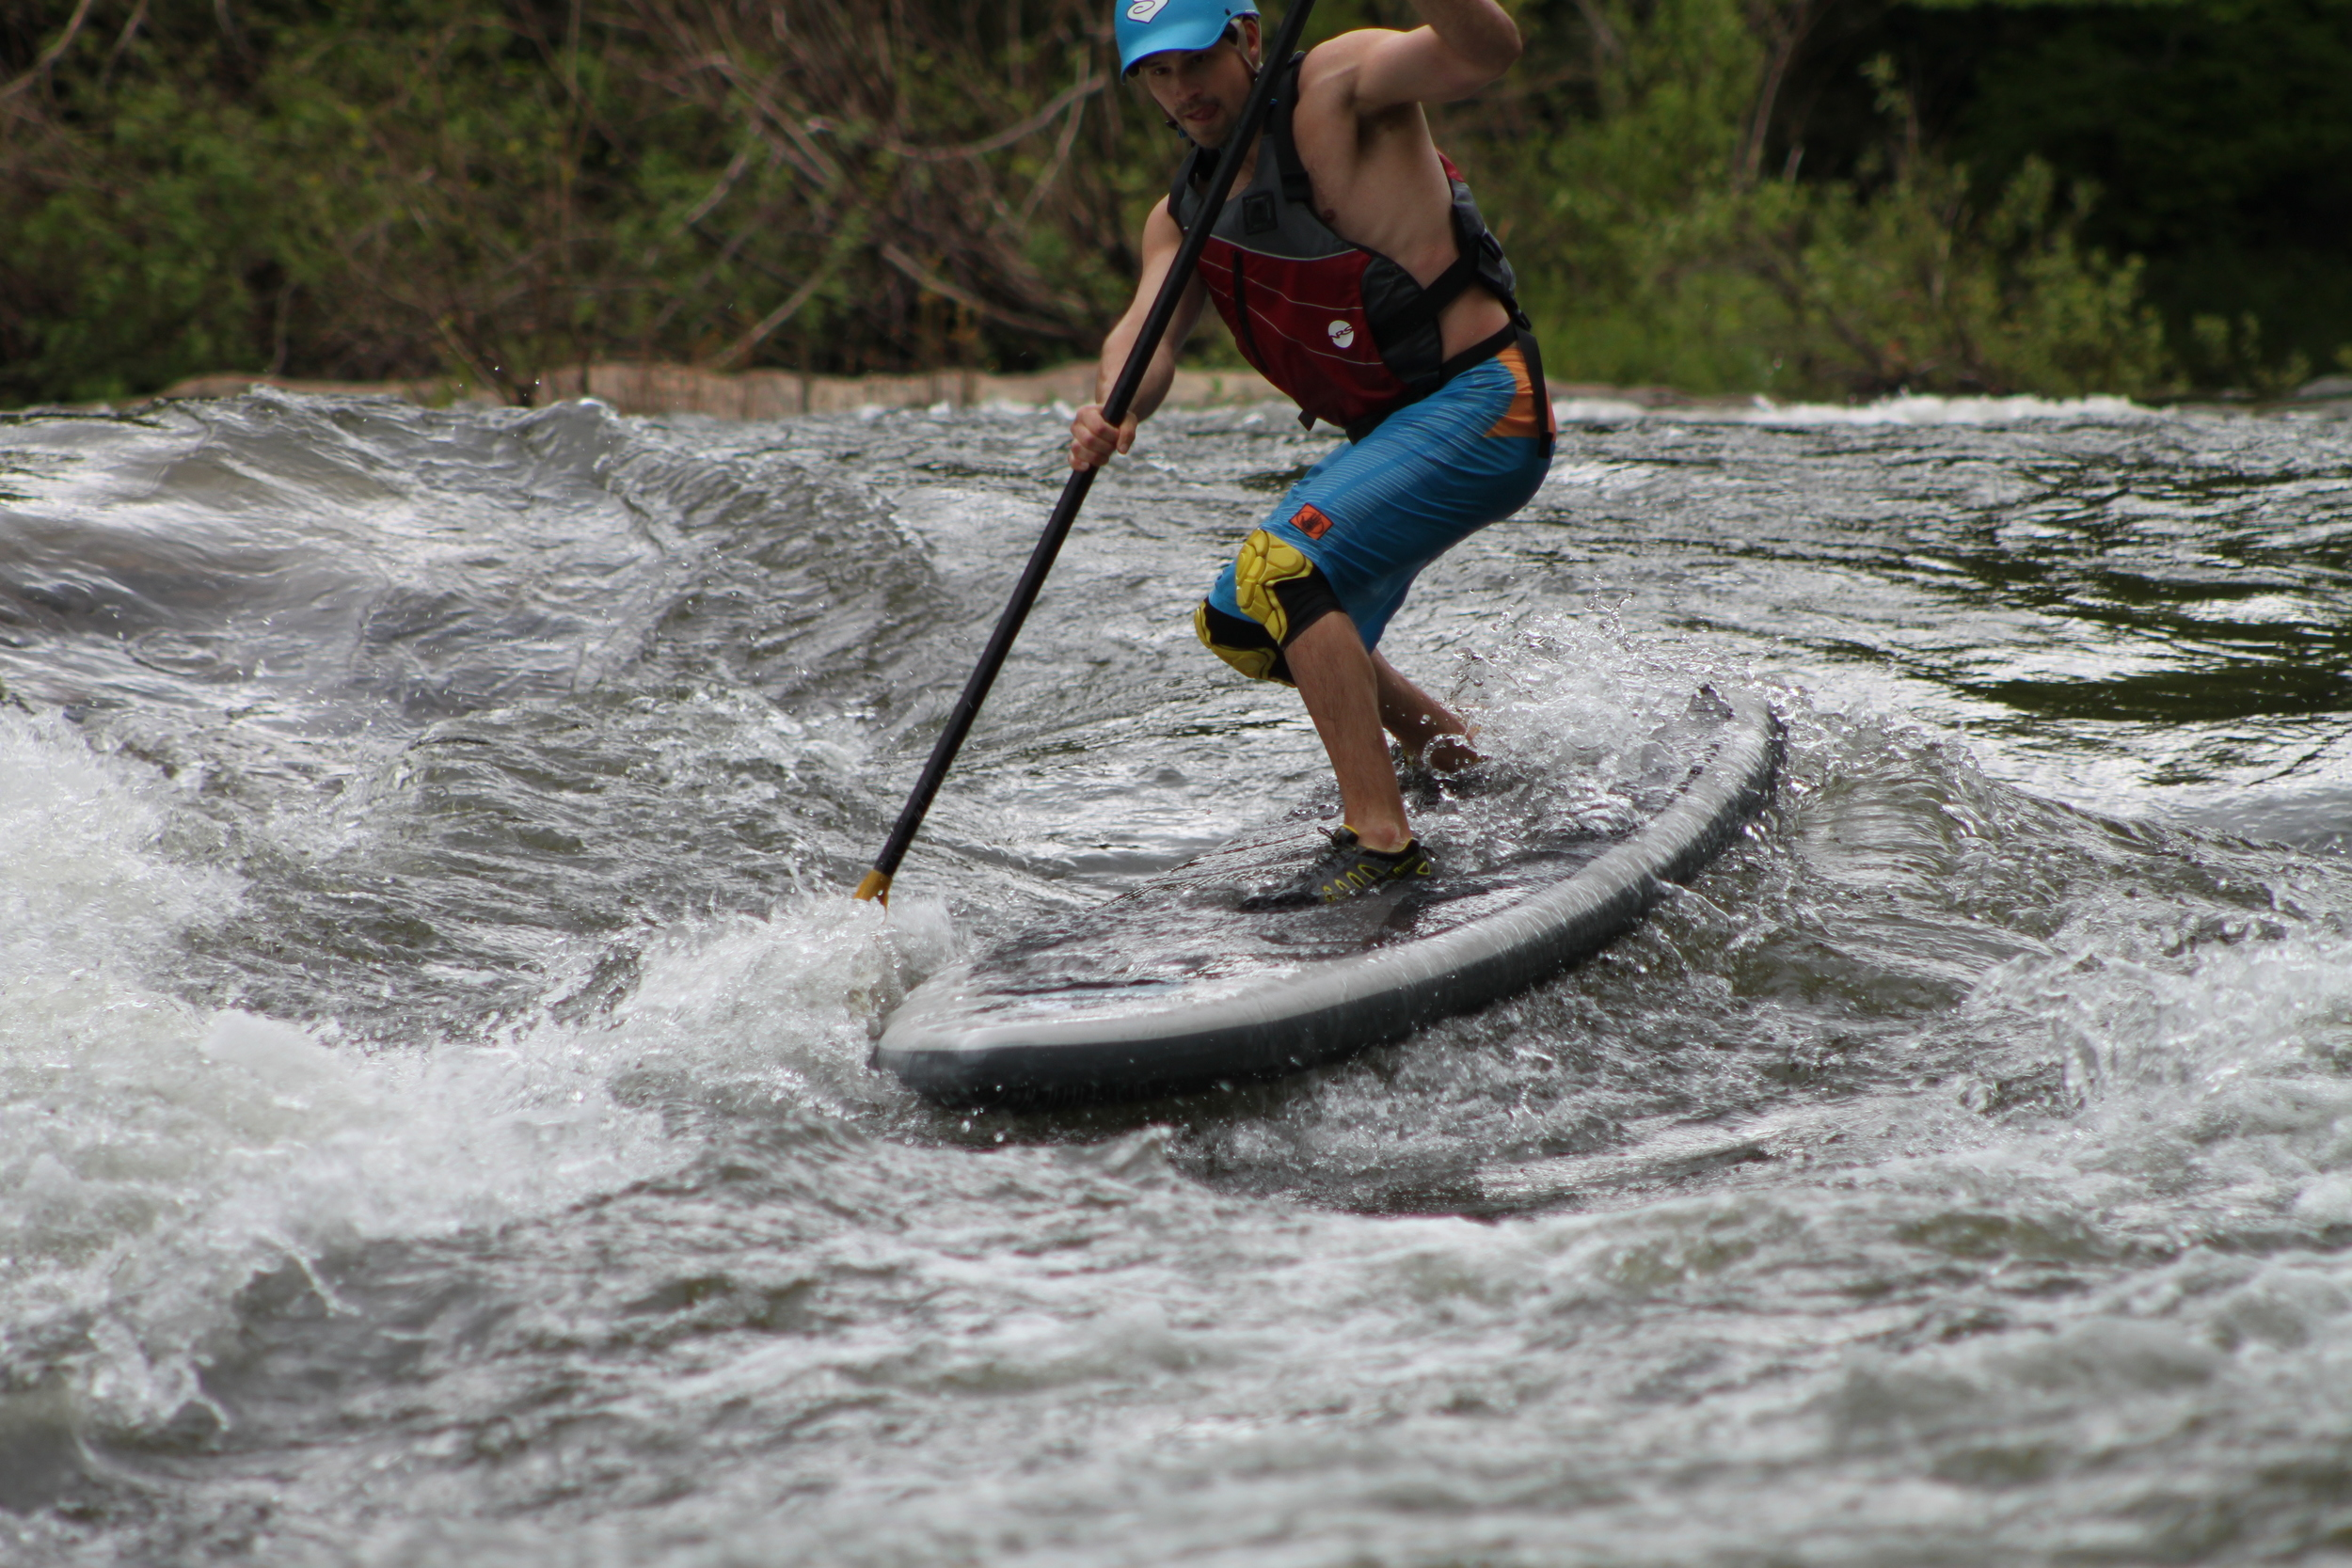 Photo: Andy May Location: Stonycreek River, PA